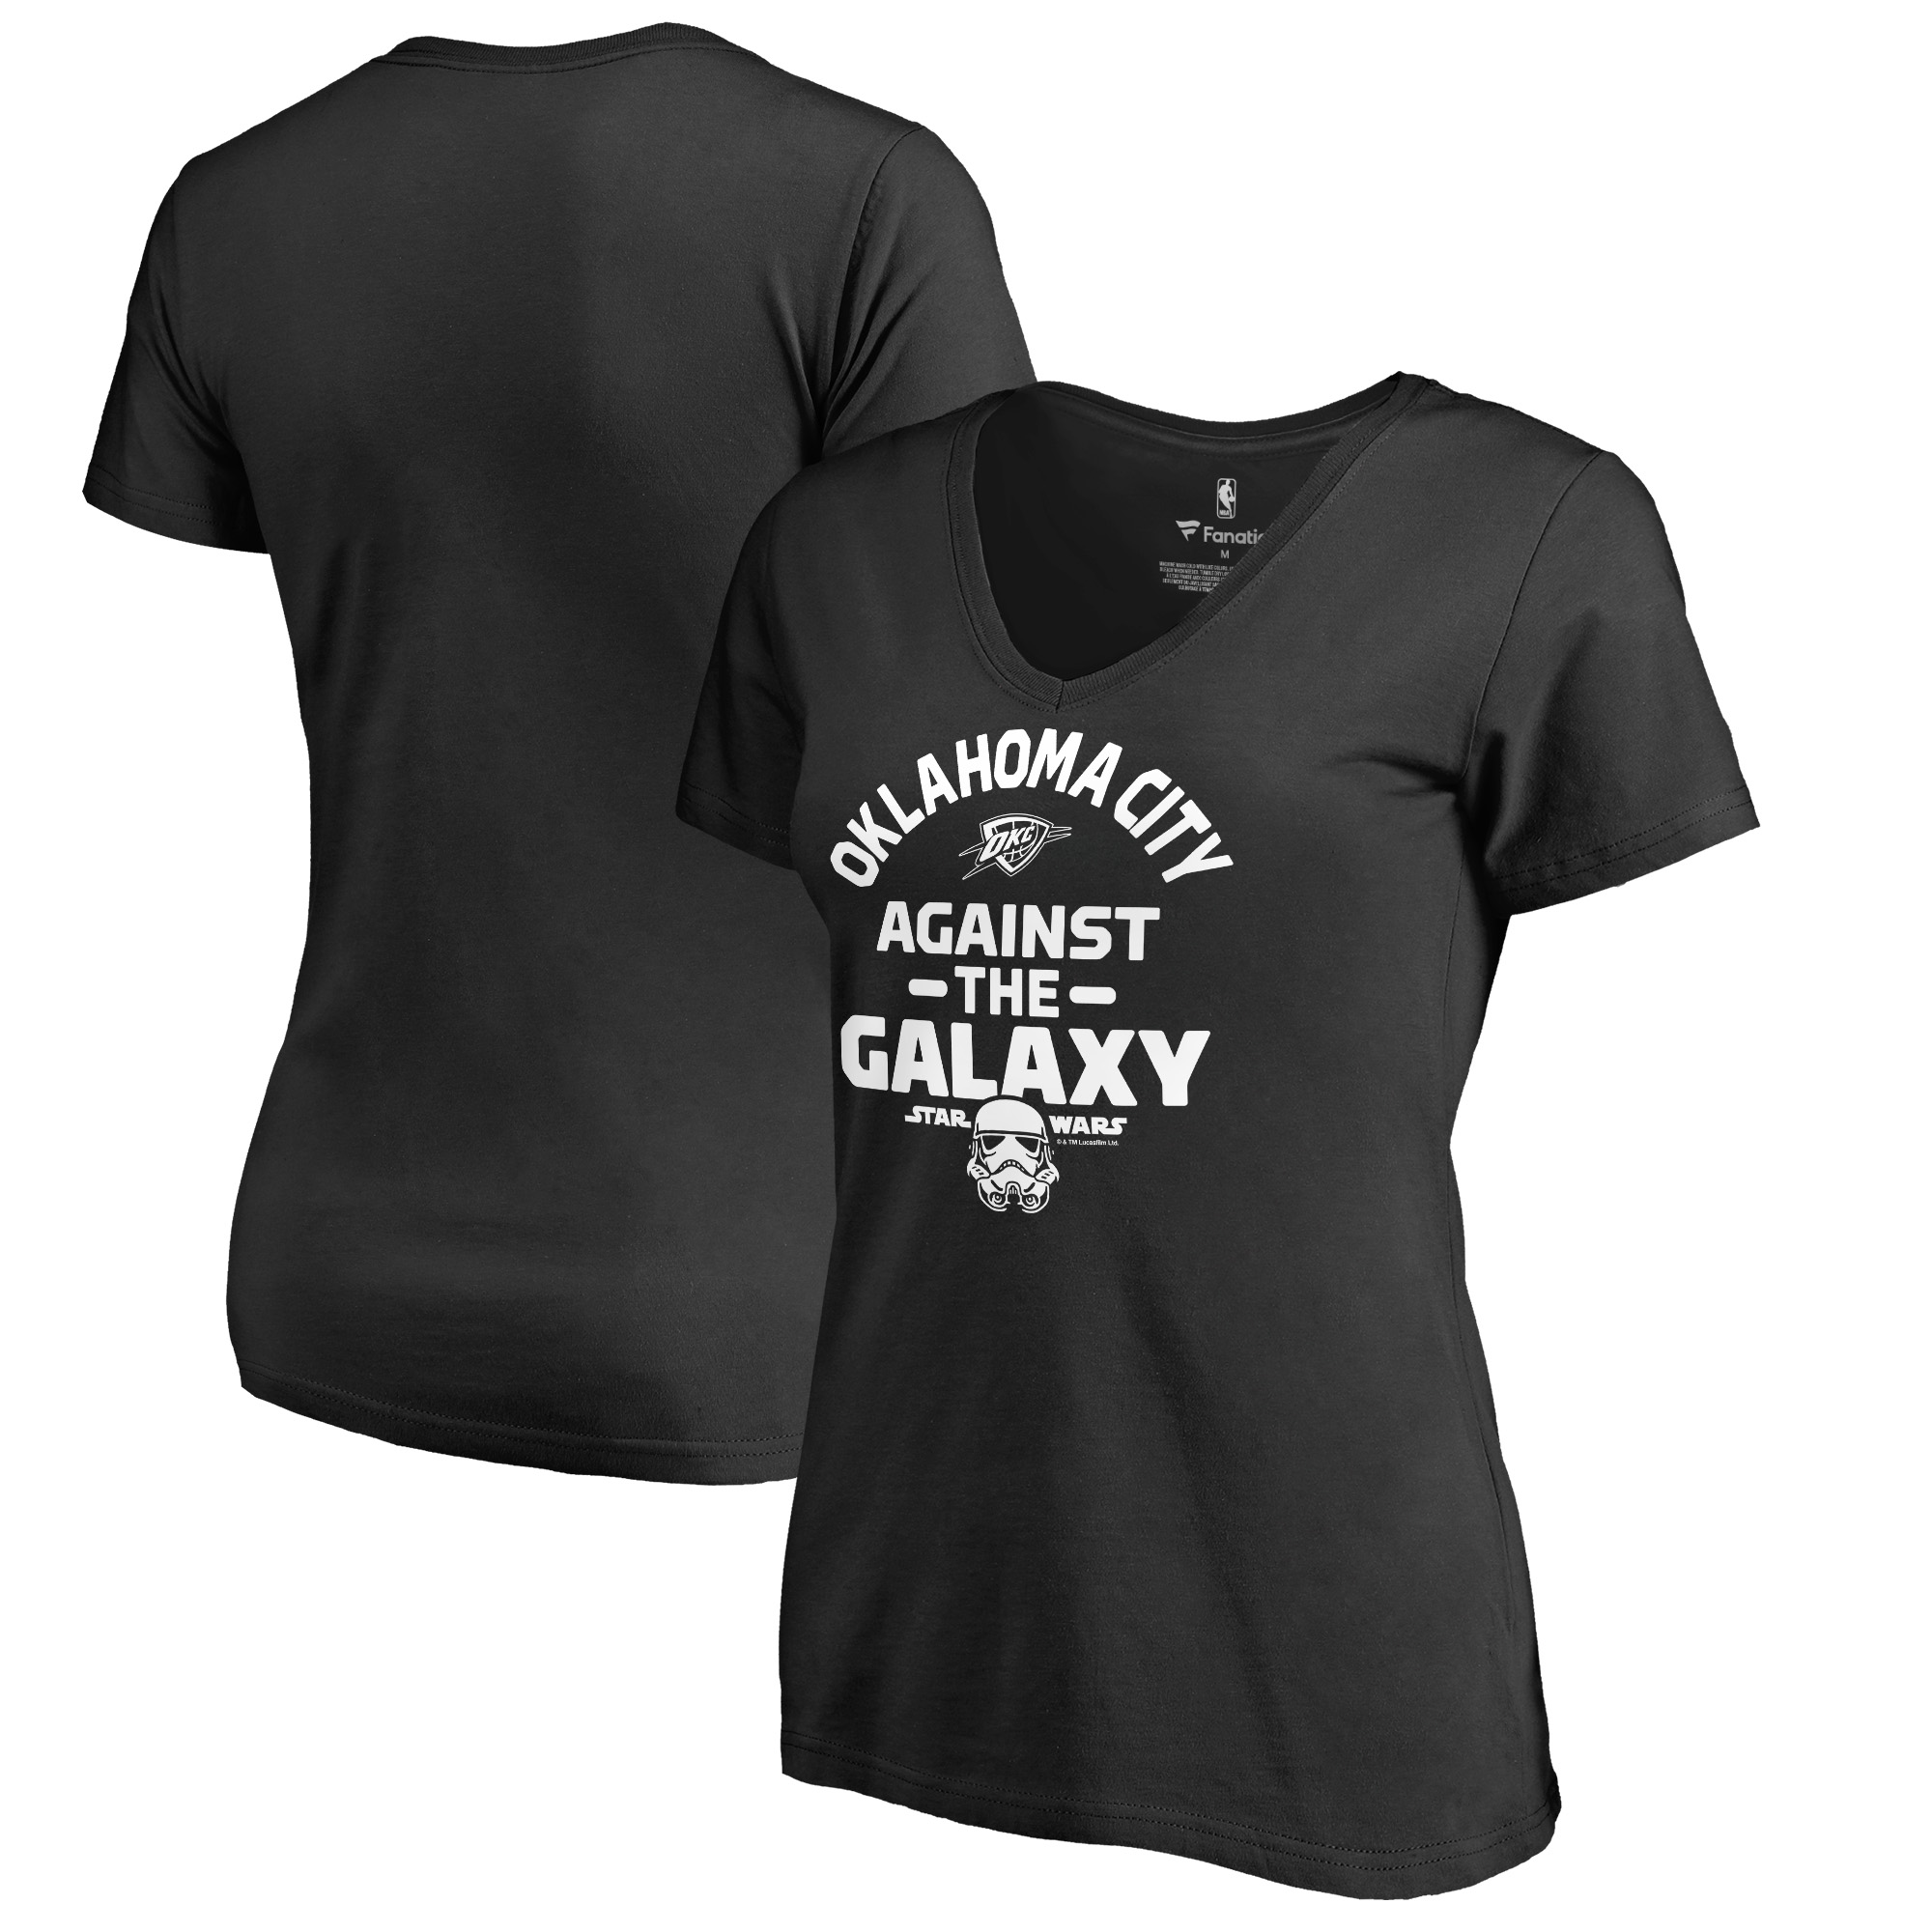 Oklahoma City Thunder Fanatics Branded Women's Star Wars Against the Galaxy V-Neck T-Shirt - Black